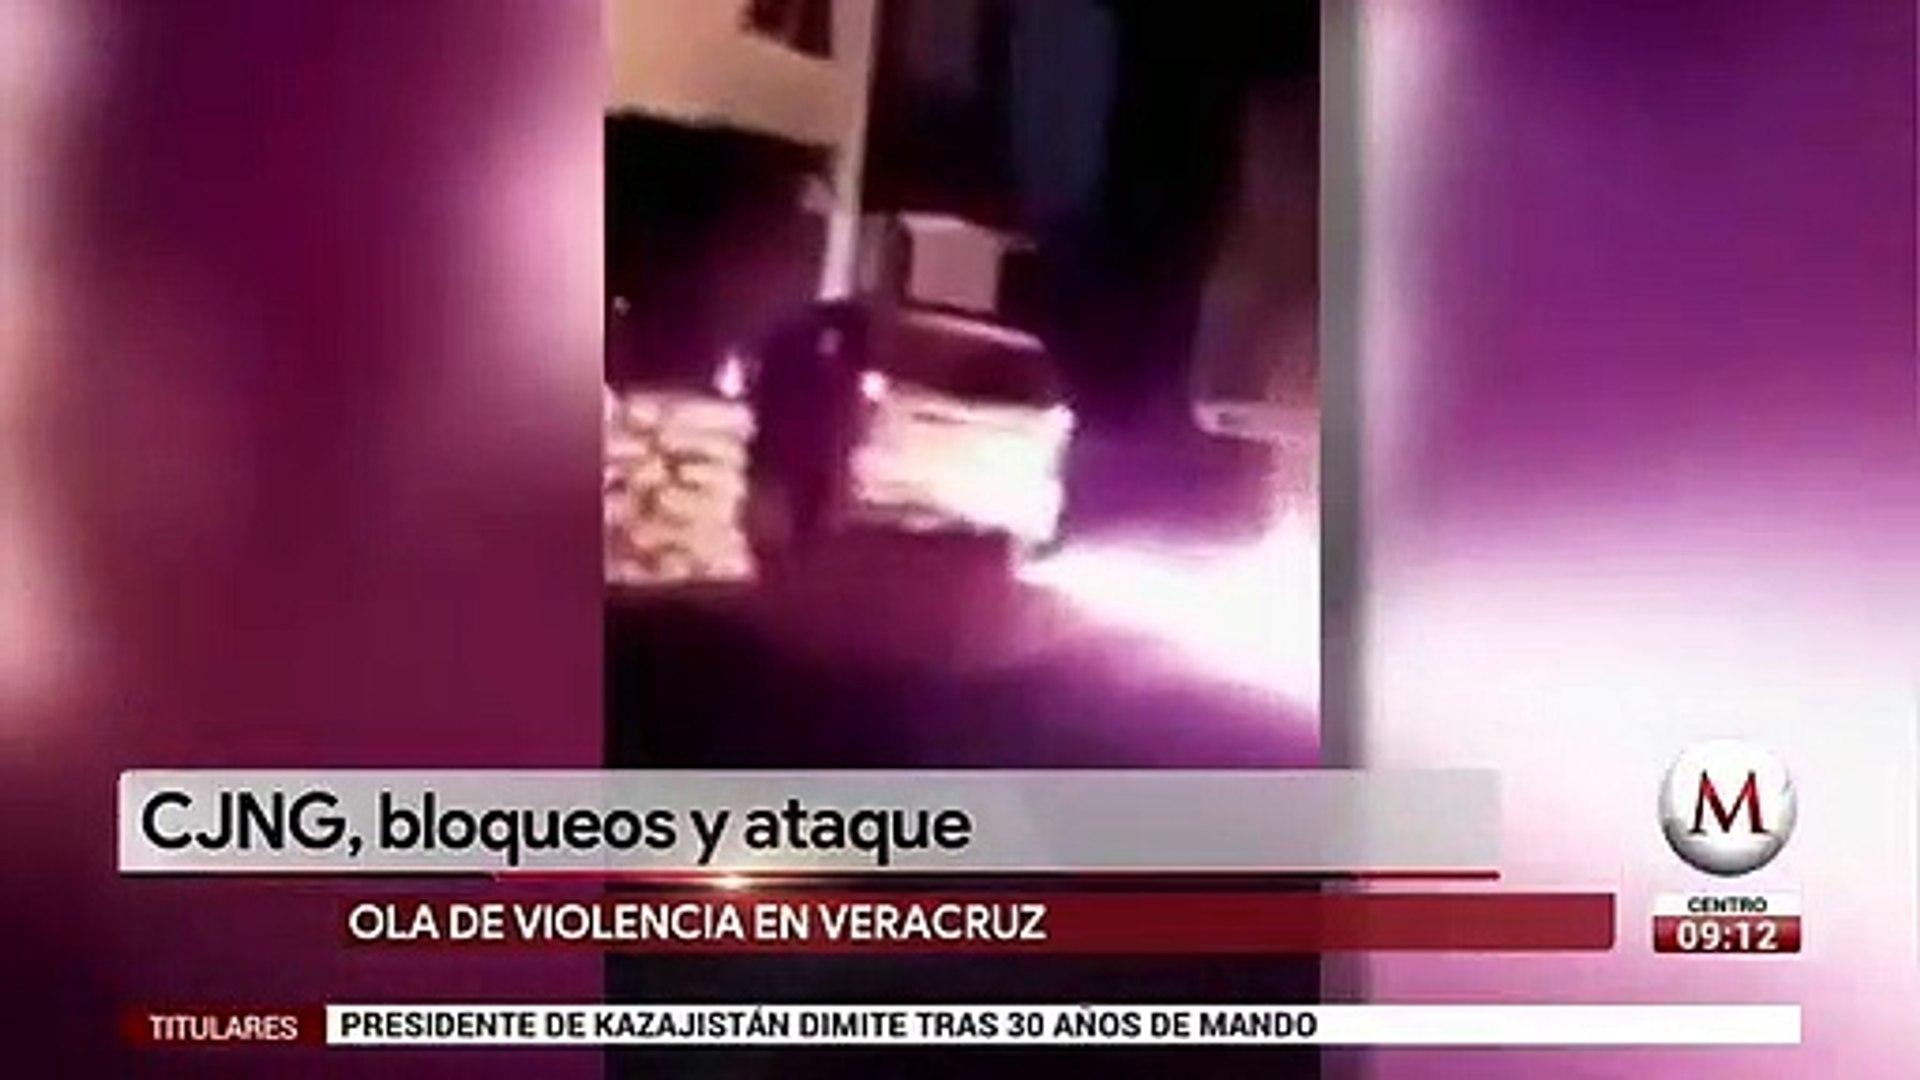 CJNG desata balacera en Veracruz